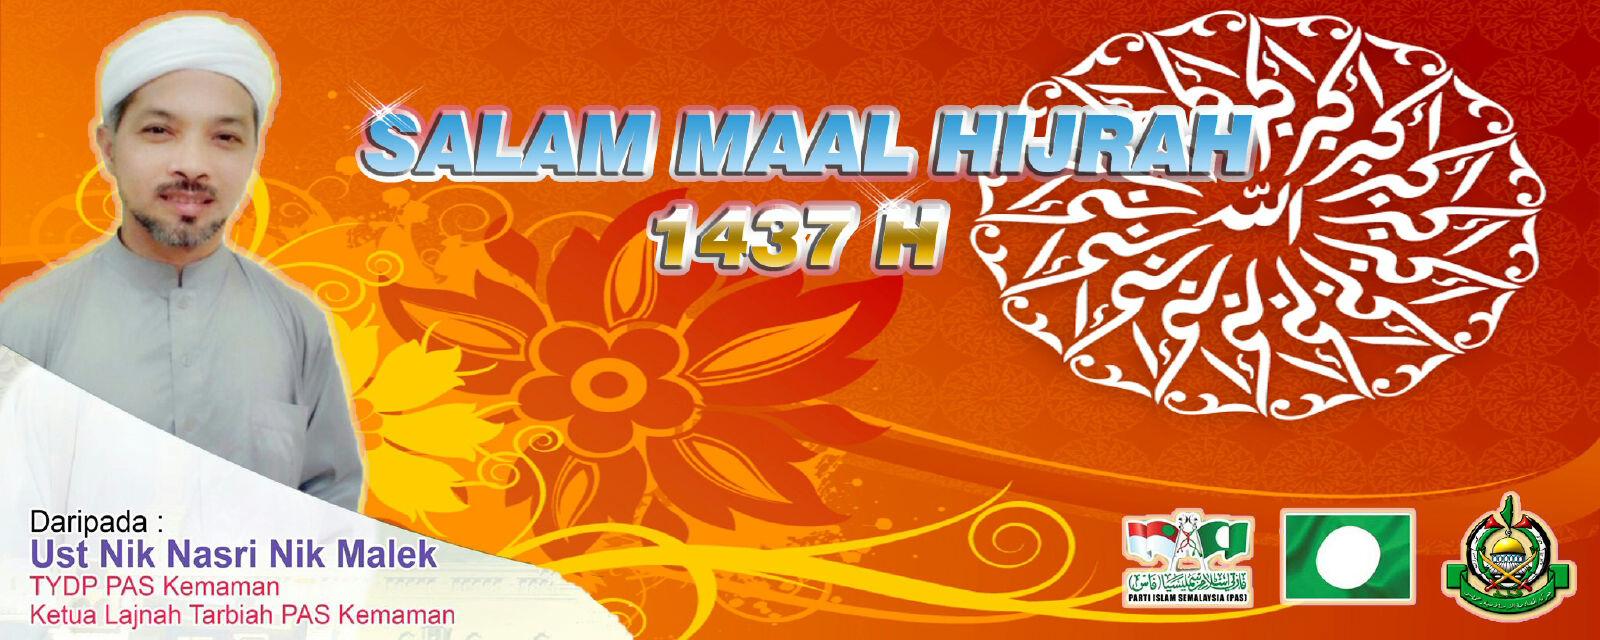 Maal Hijrah 1437 H